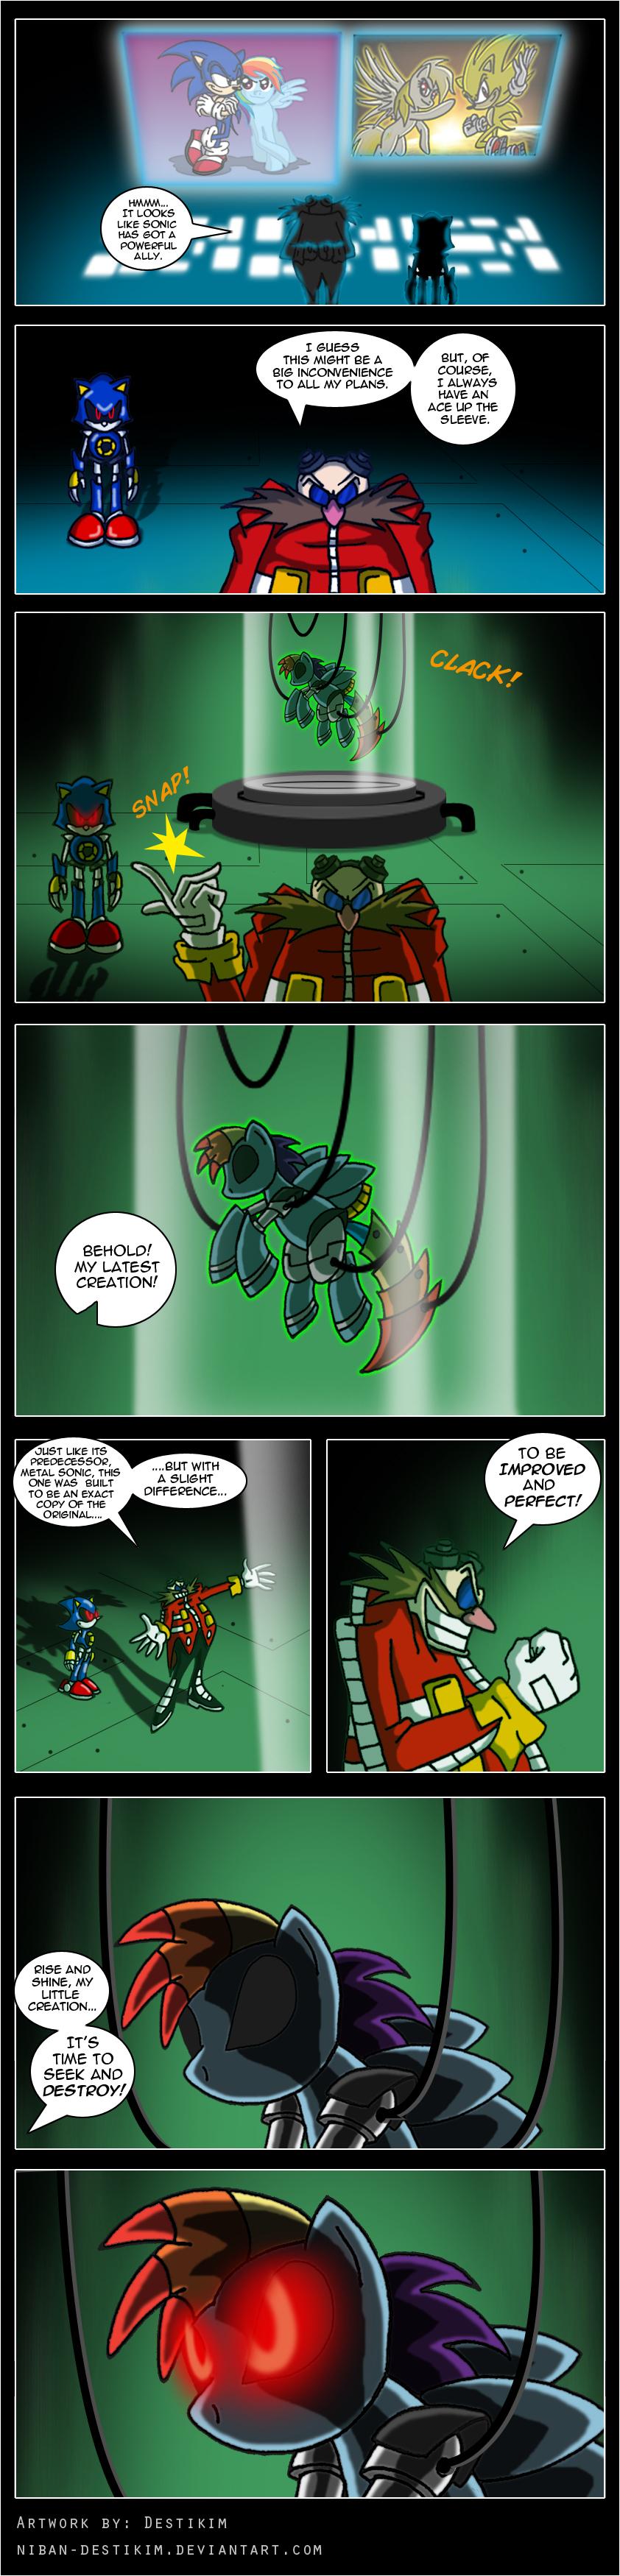 279881 Artistniban Destikim Comic Crossover Doctor Eggman